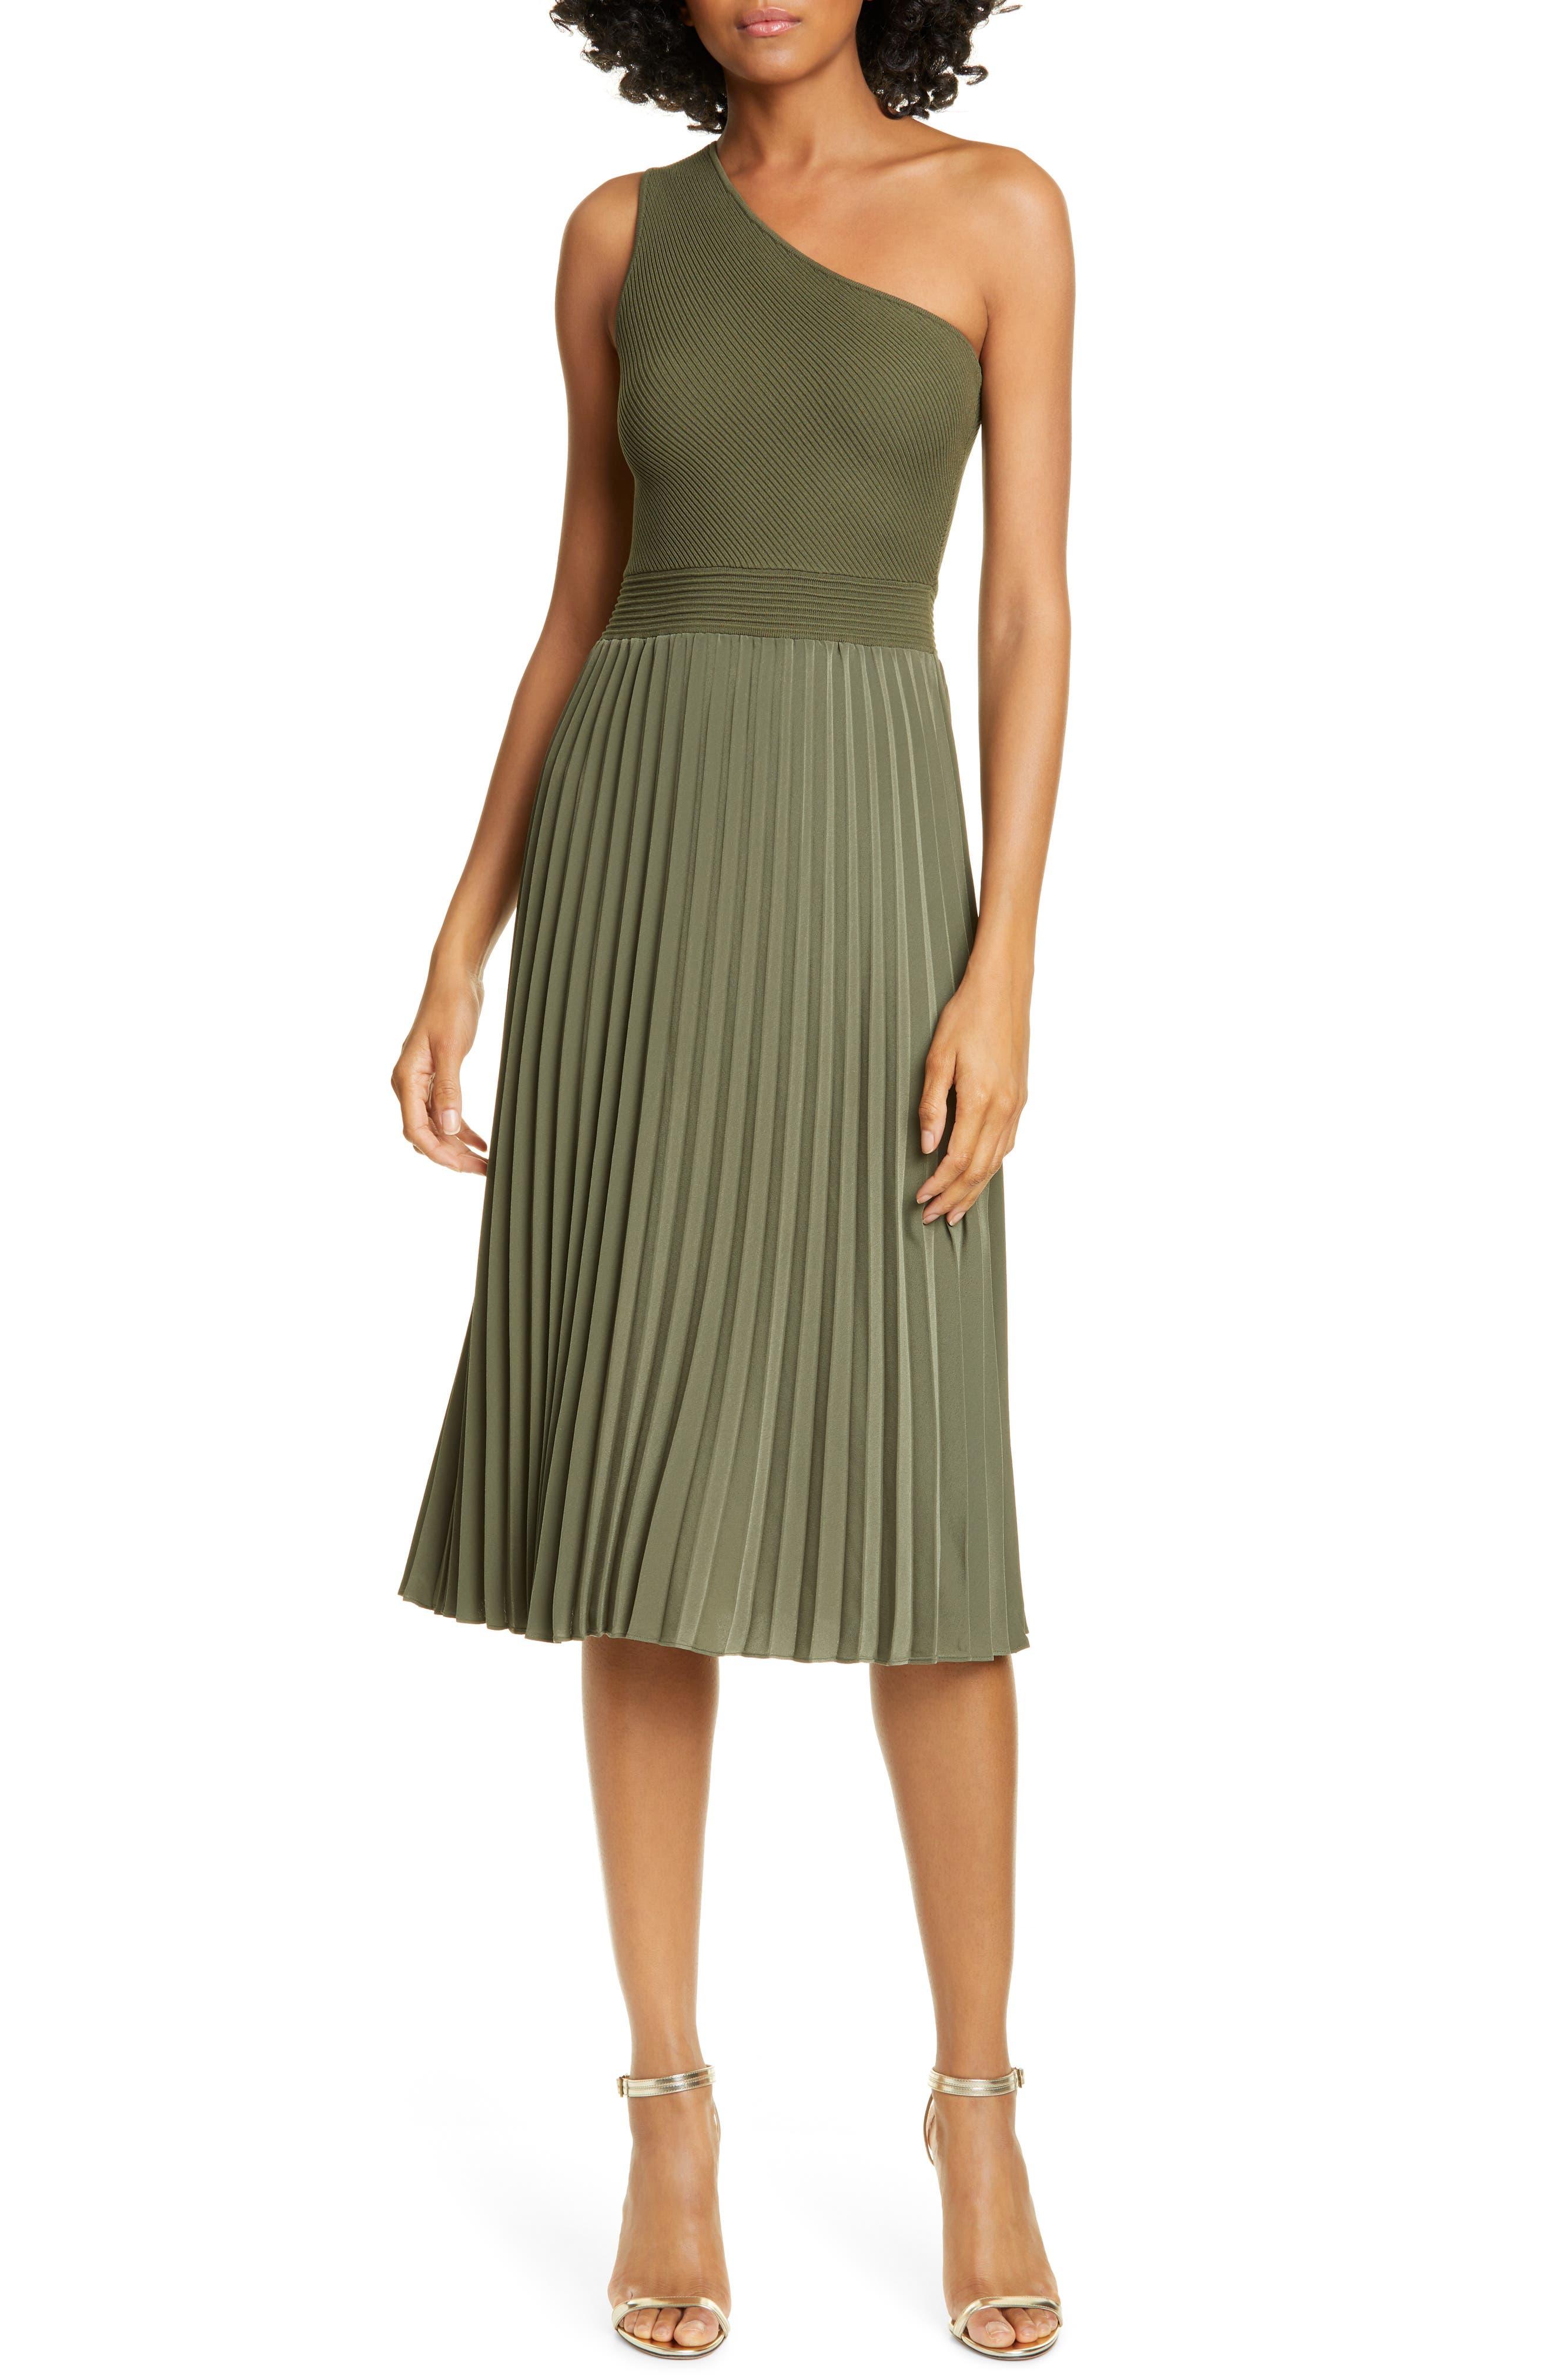 Ted Baker London Miriom Mixed Media One-Shoulder Dress, Beige